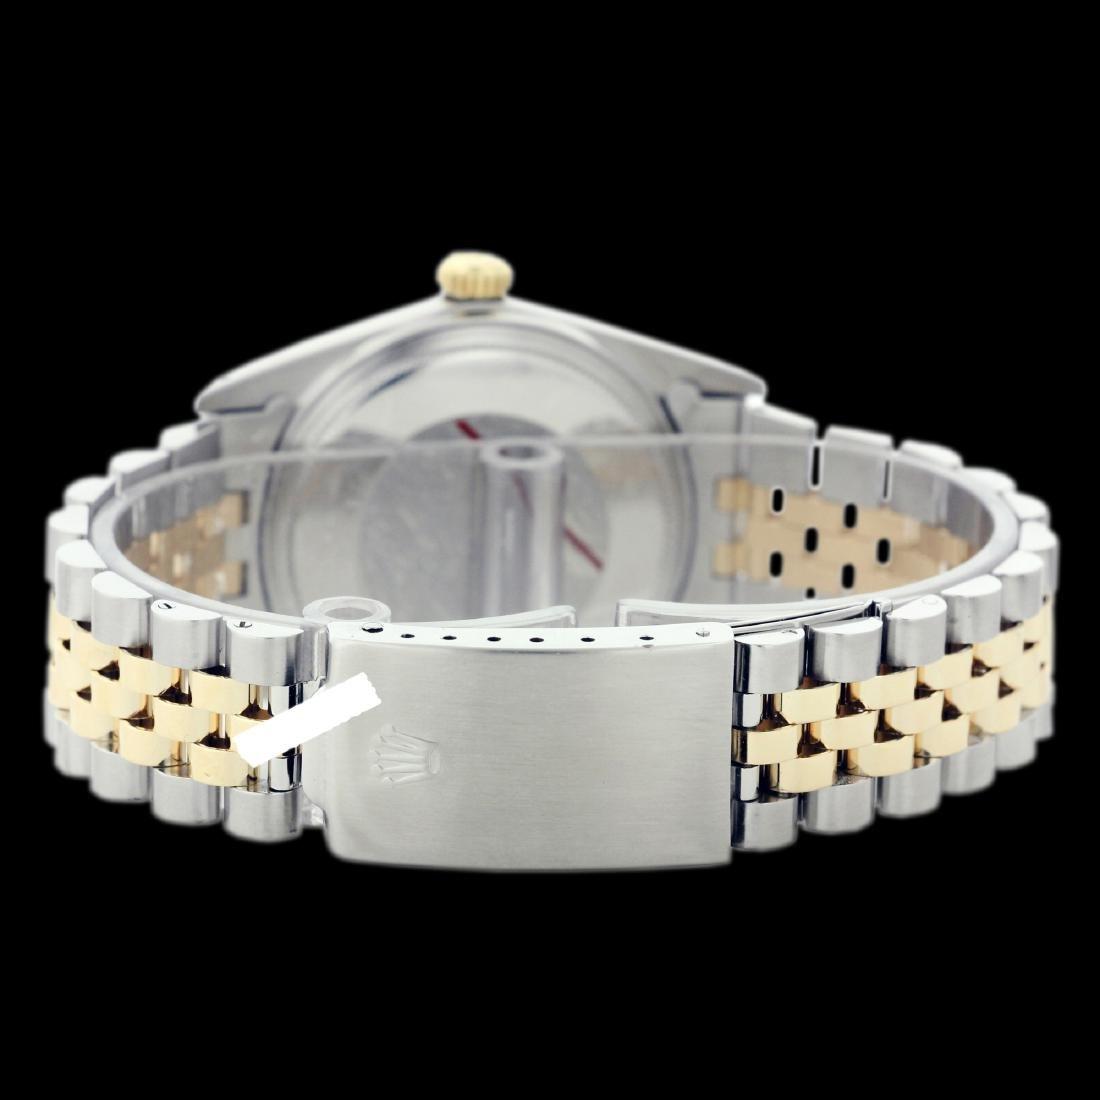 Rolex Men's Two Tone 14K Gold/SS, QuickSet, Diamond - 3